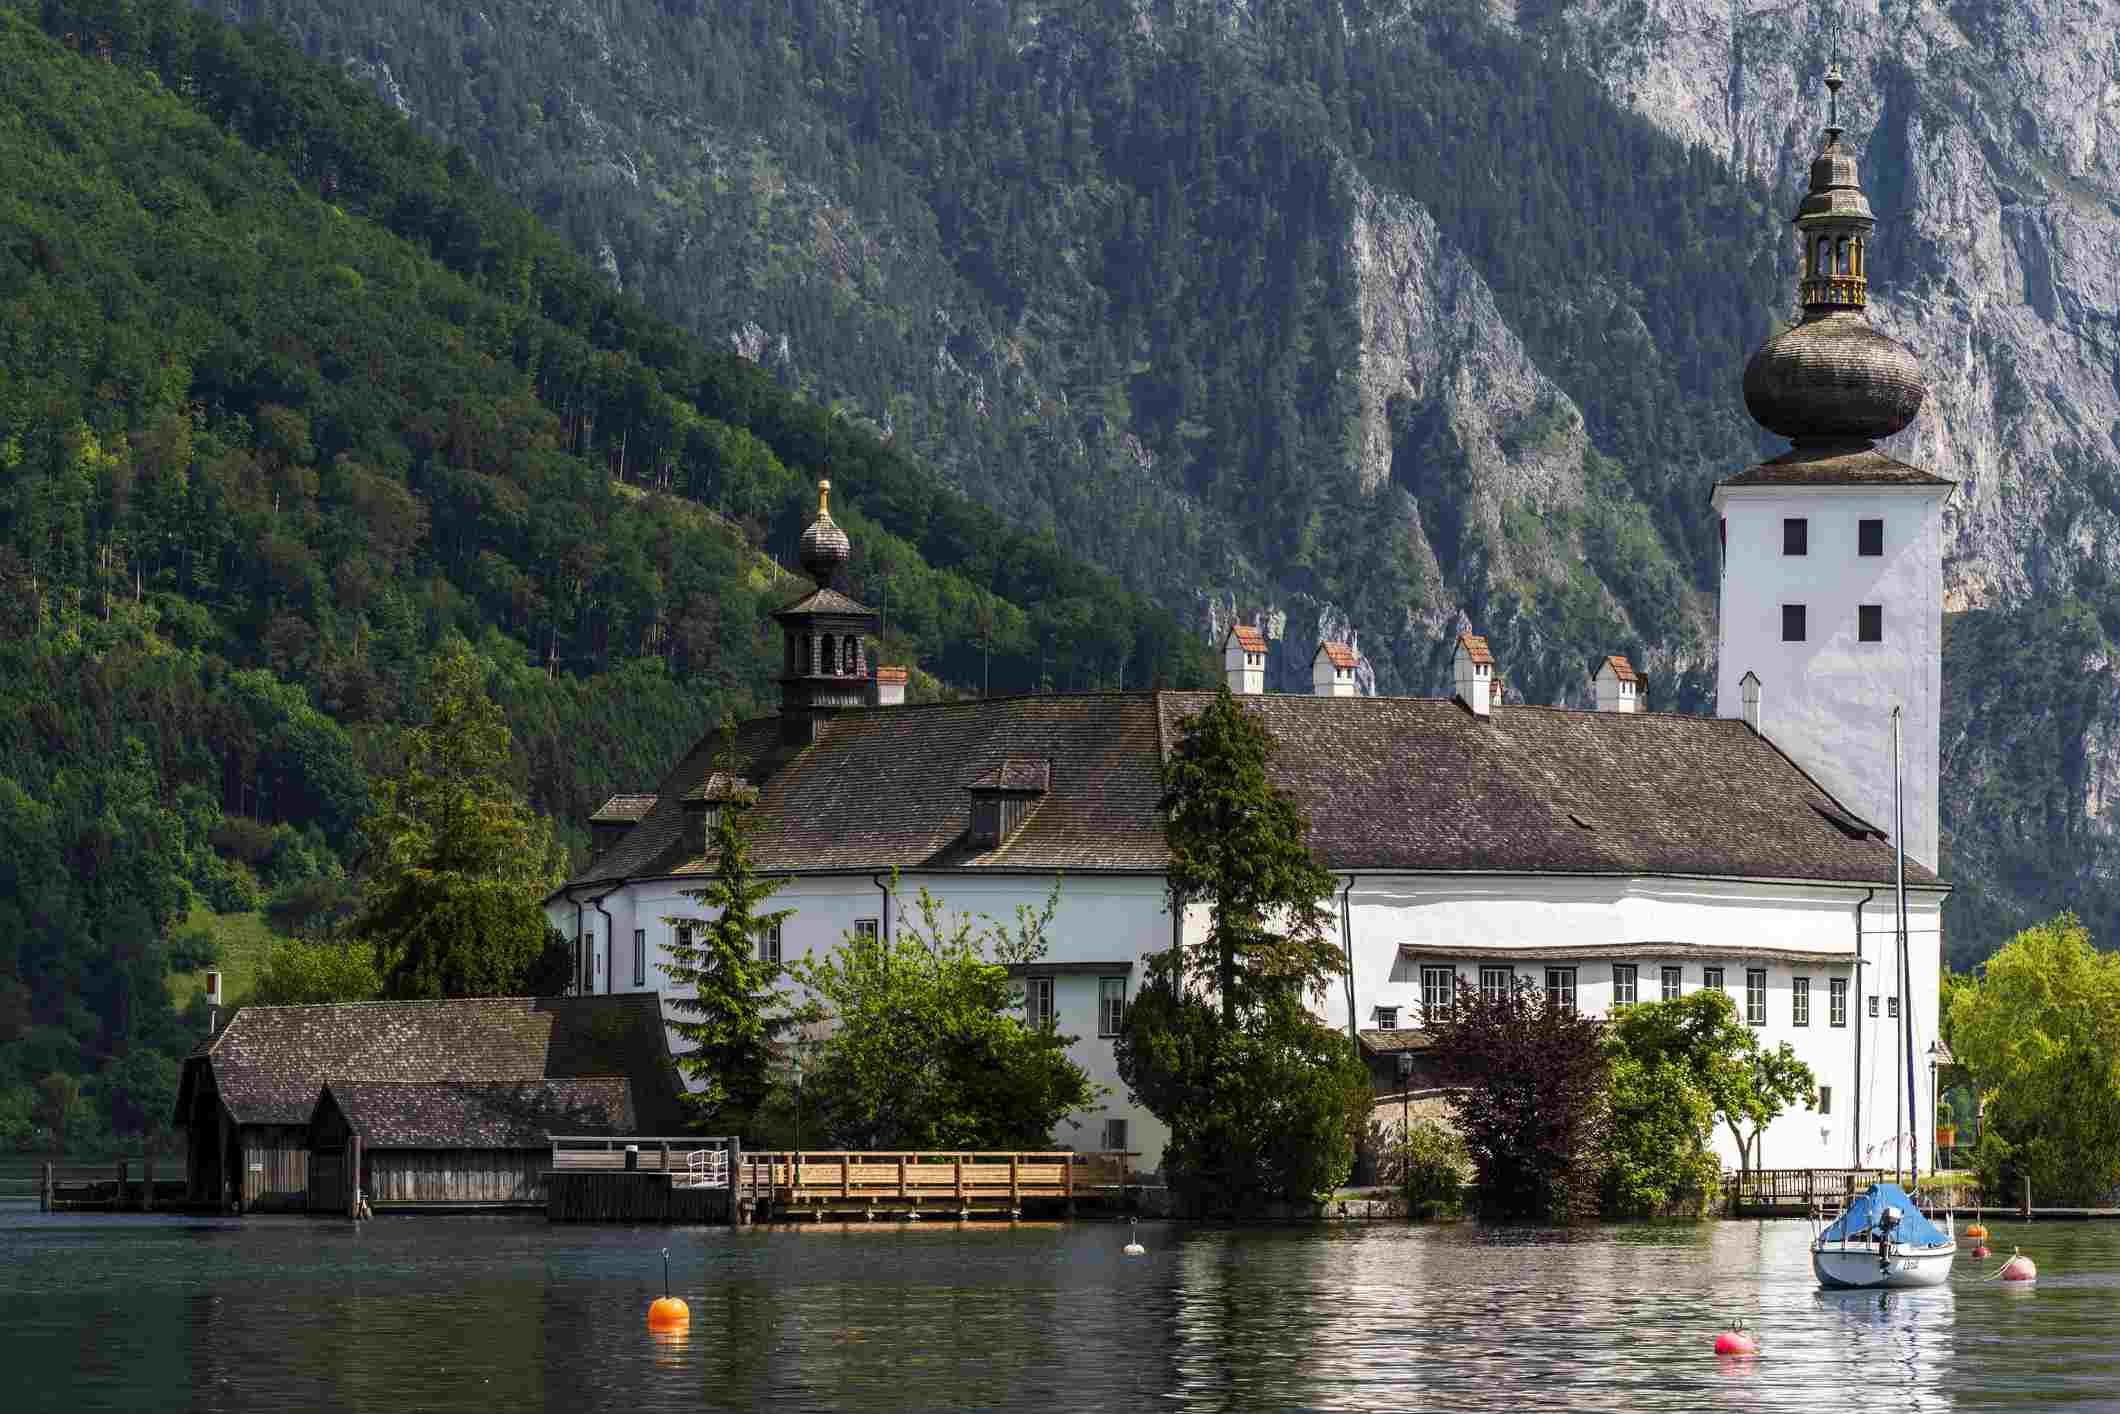 Gmunden, Exterior of Schloss Ort castle, Austria